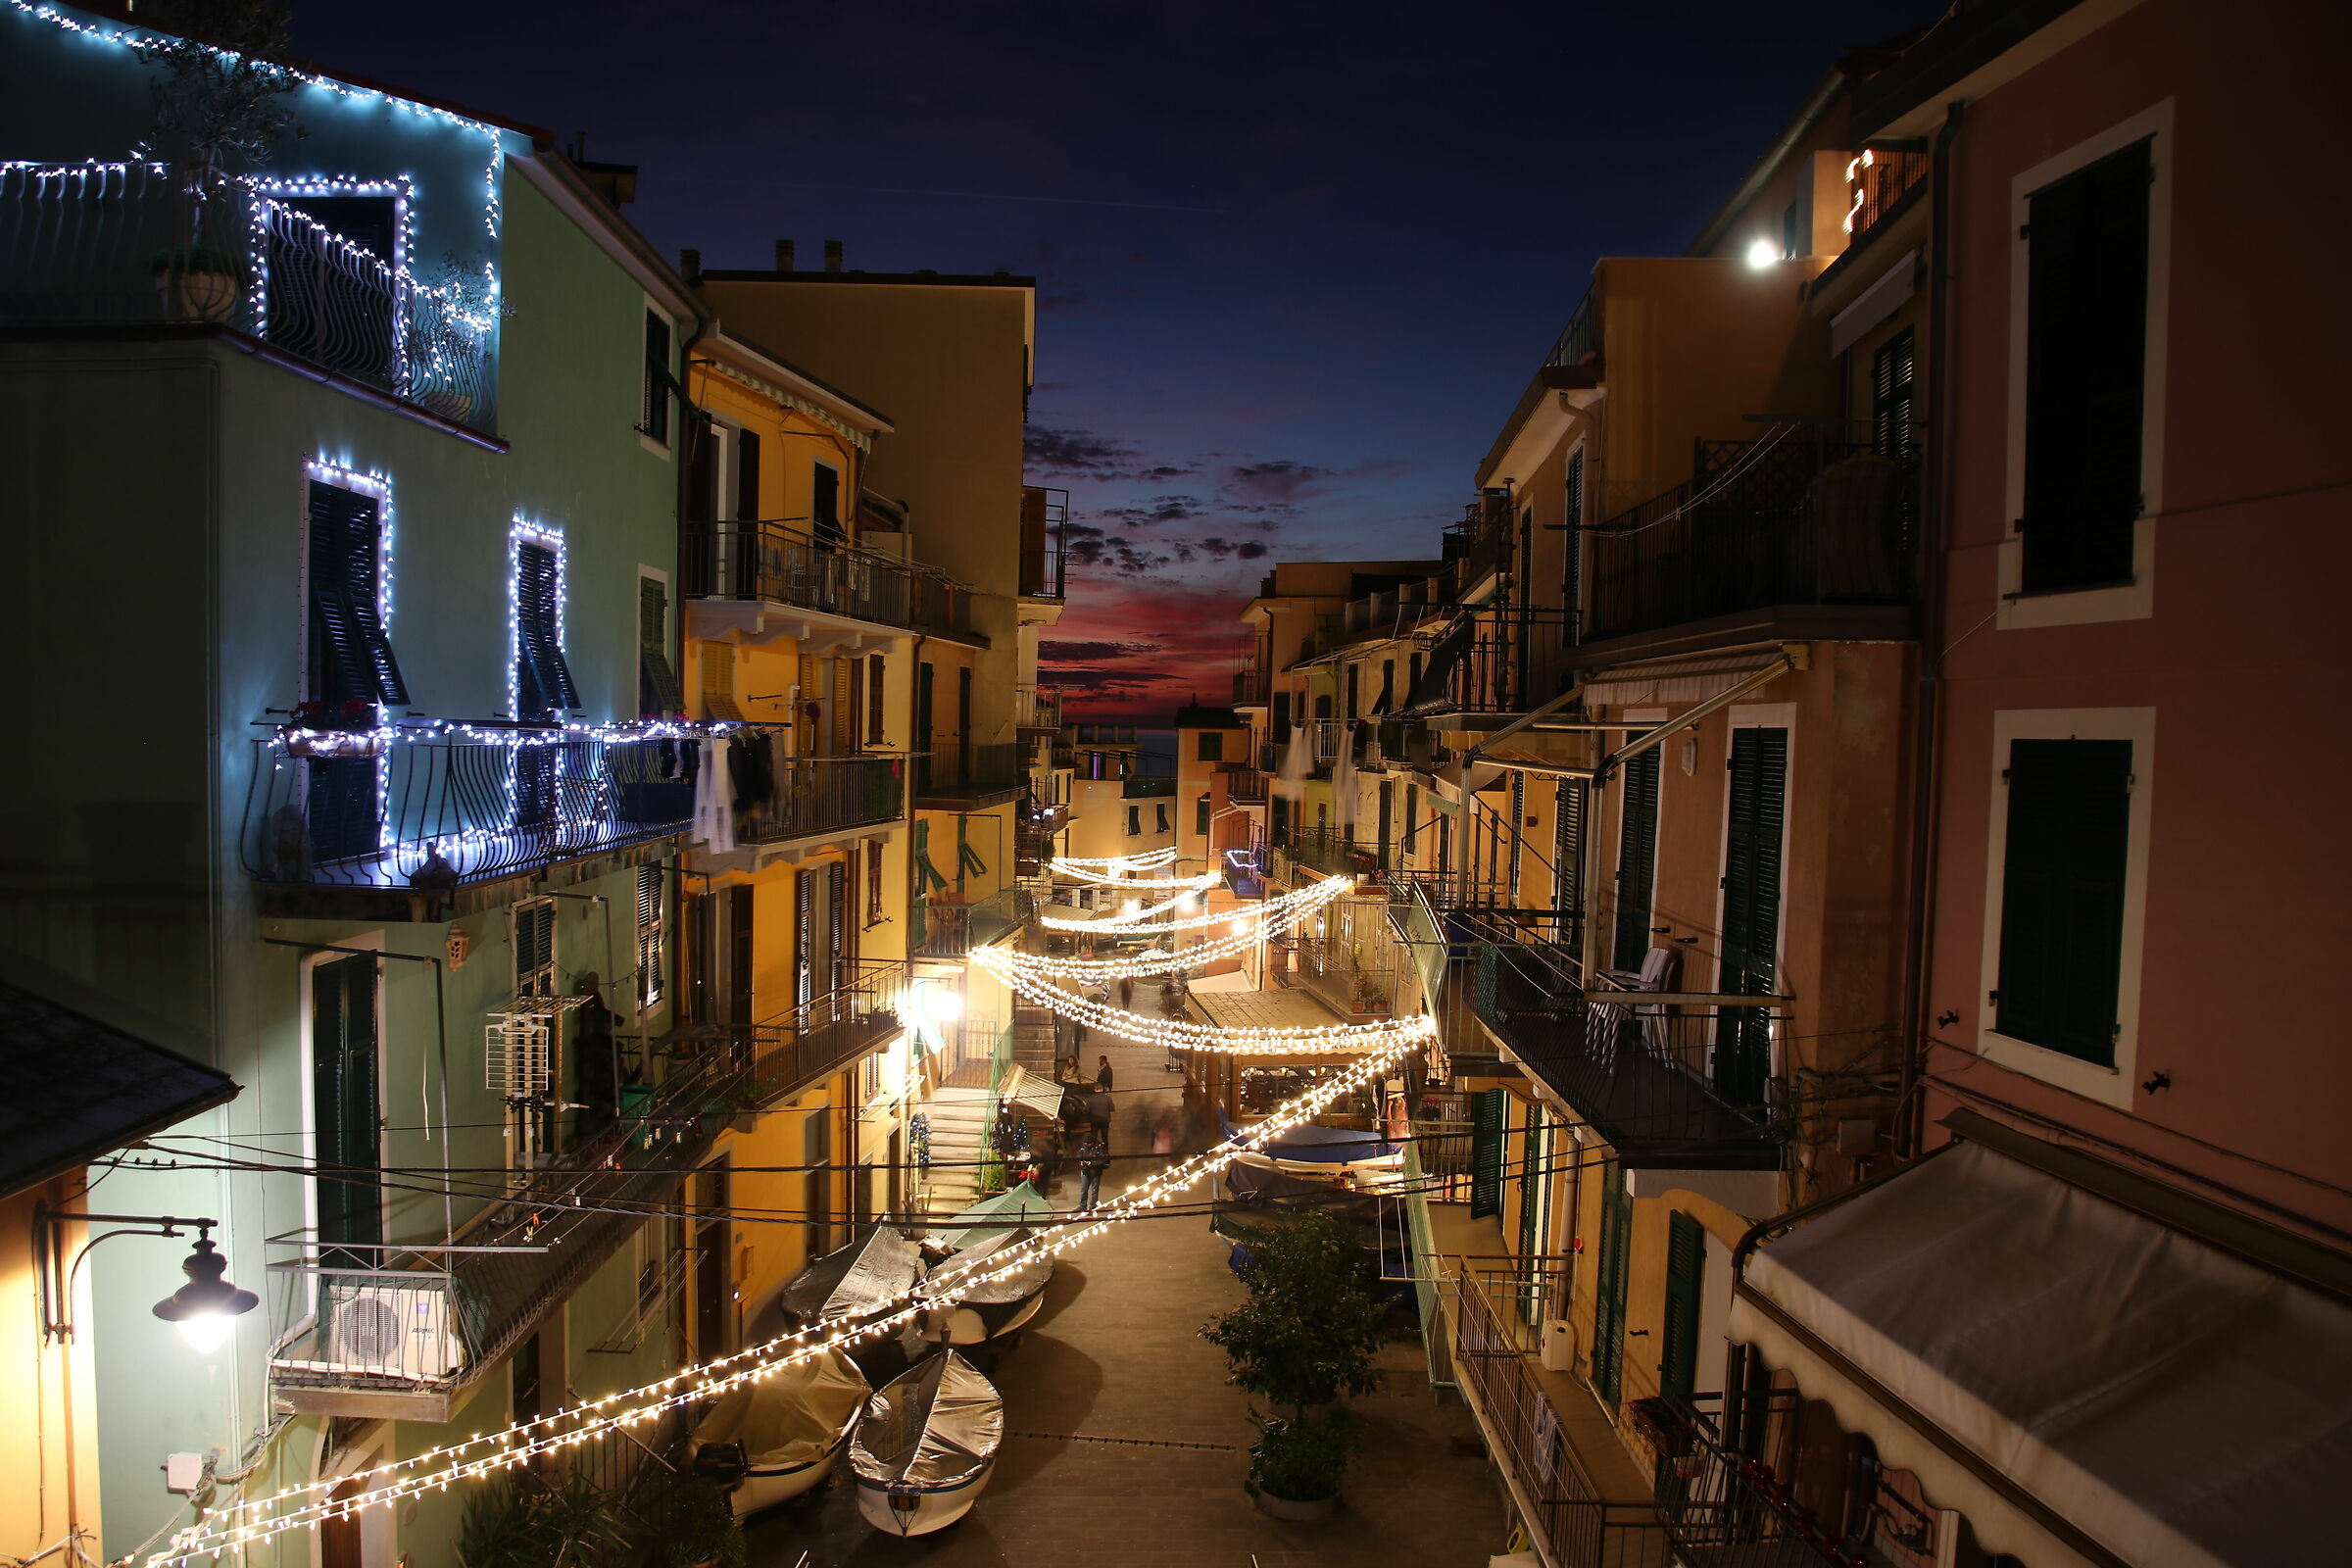 Manarola centro, Cinque Terre (La Spezia) - 31.12.2019...